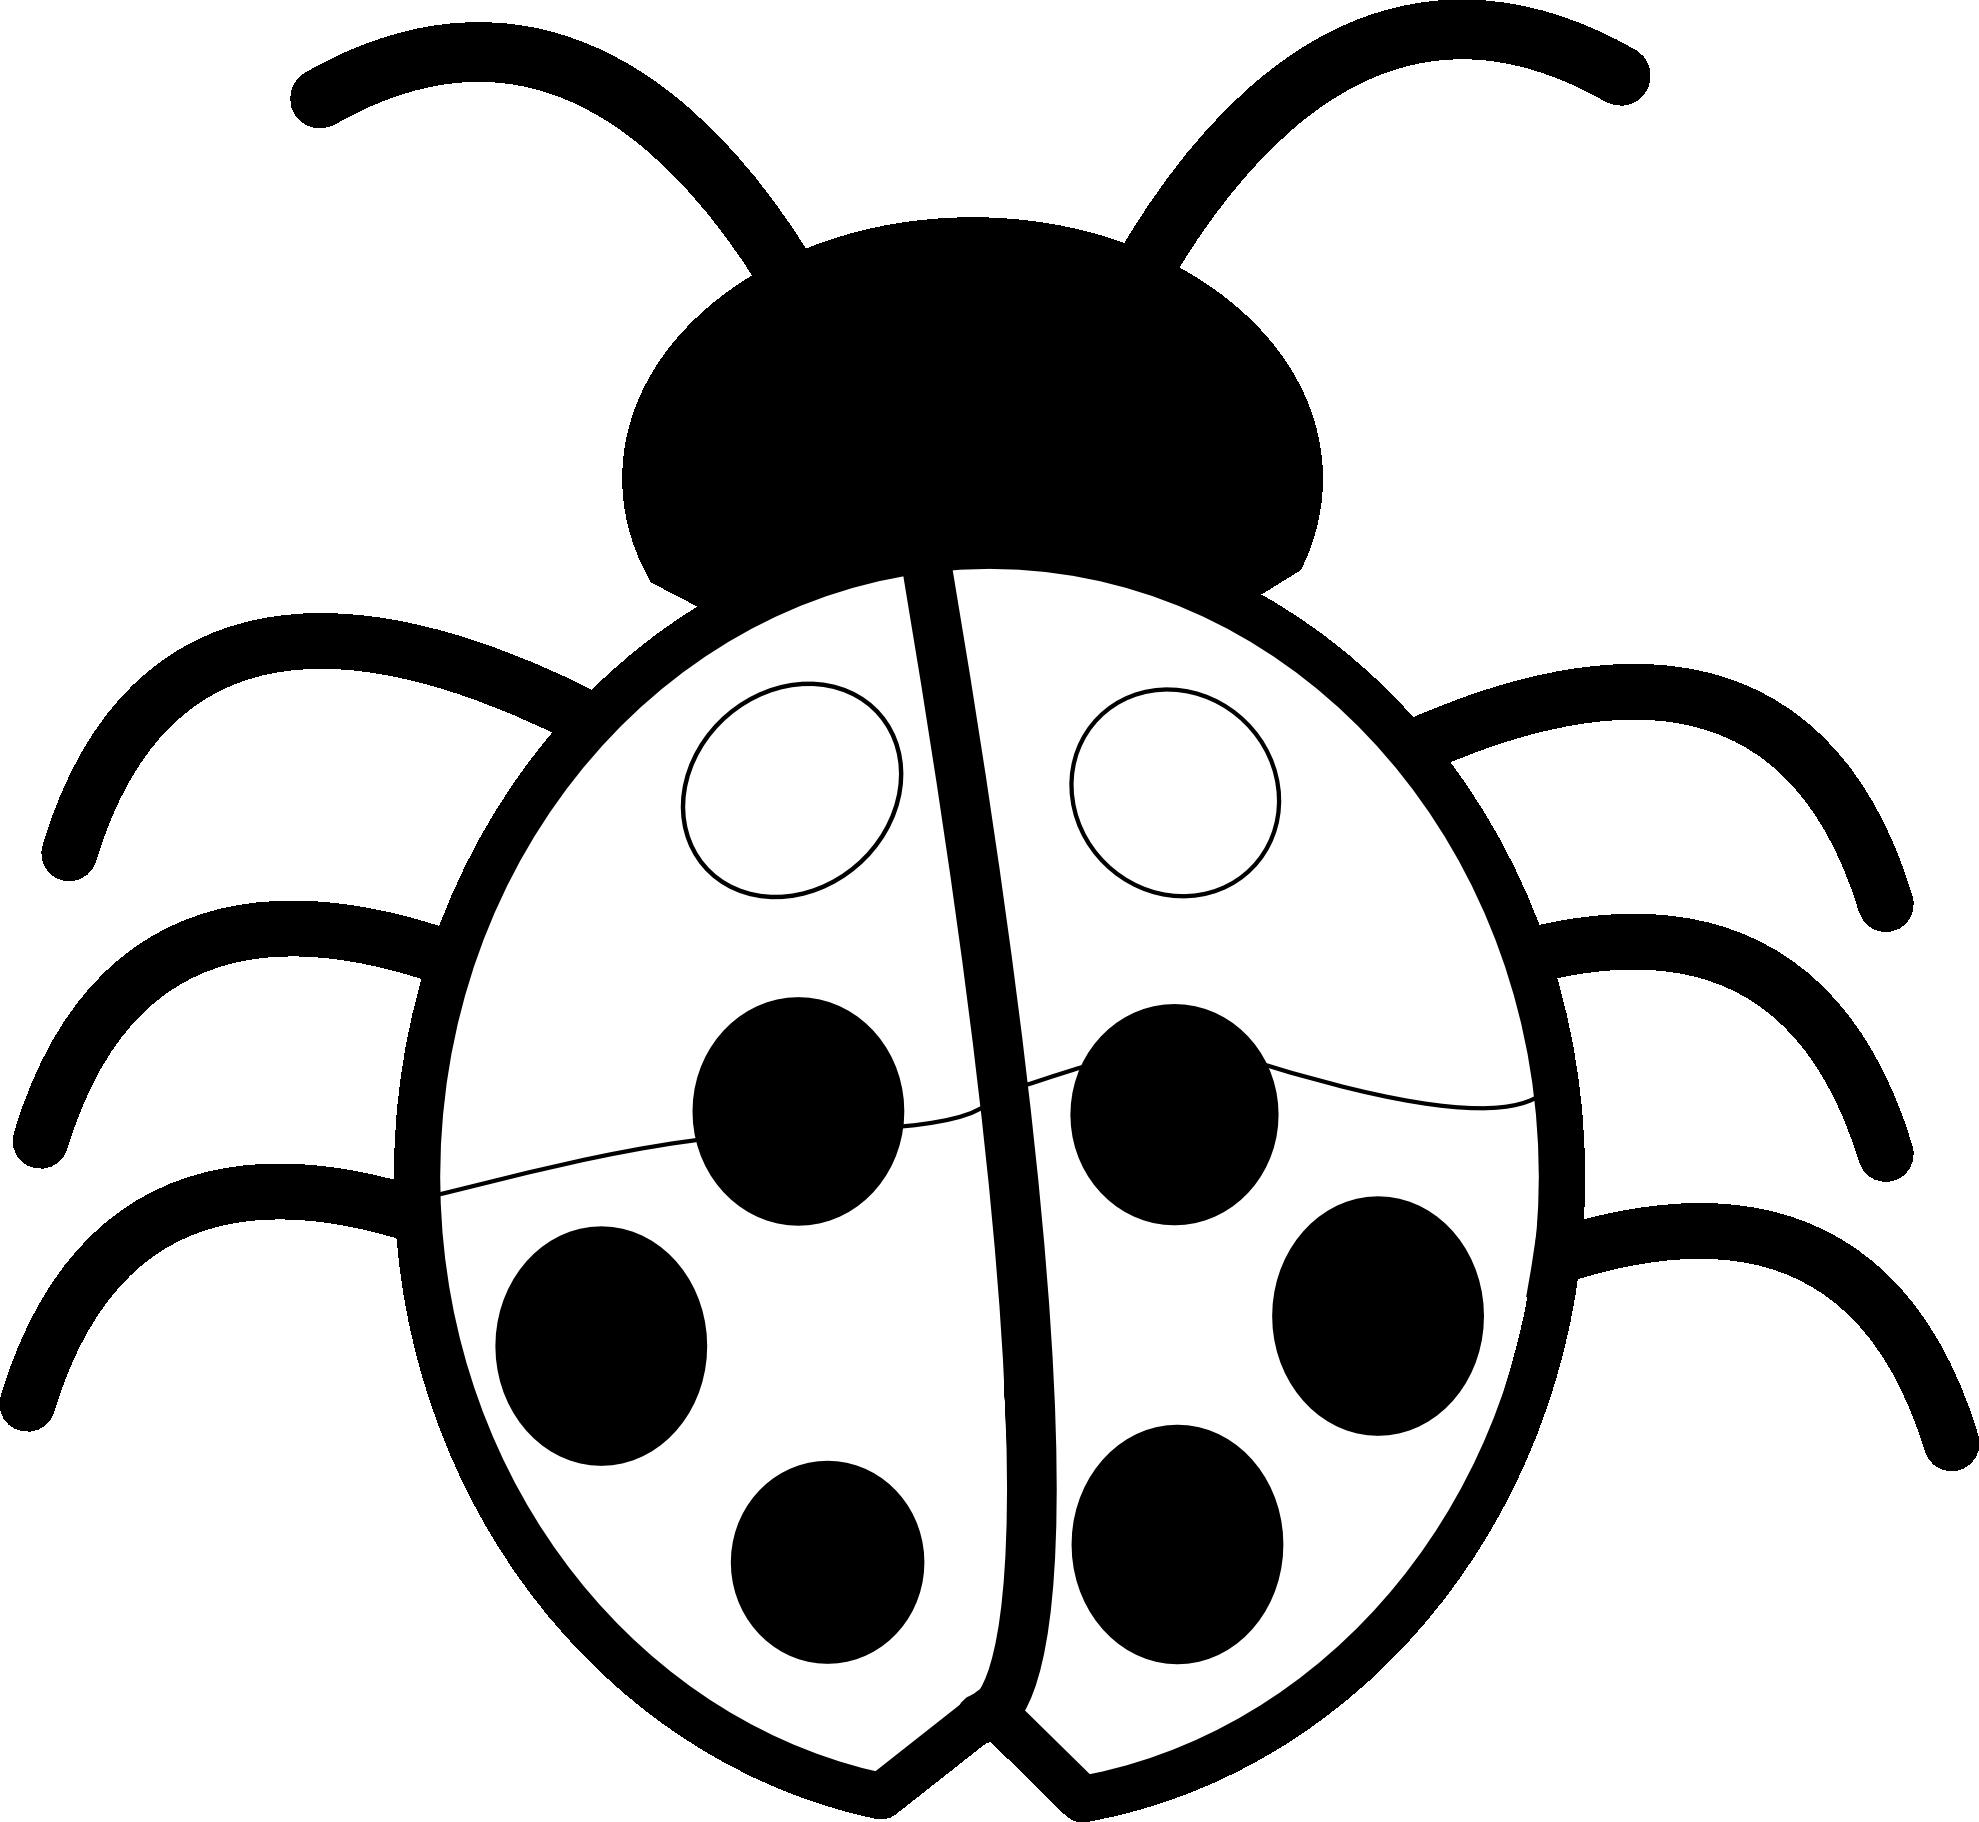 Ladybug Clipart Black And White | Clipart Panda - Free